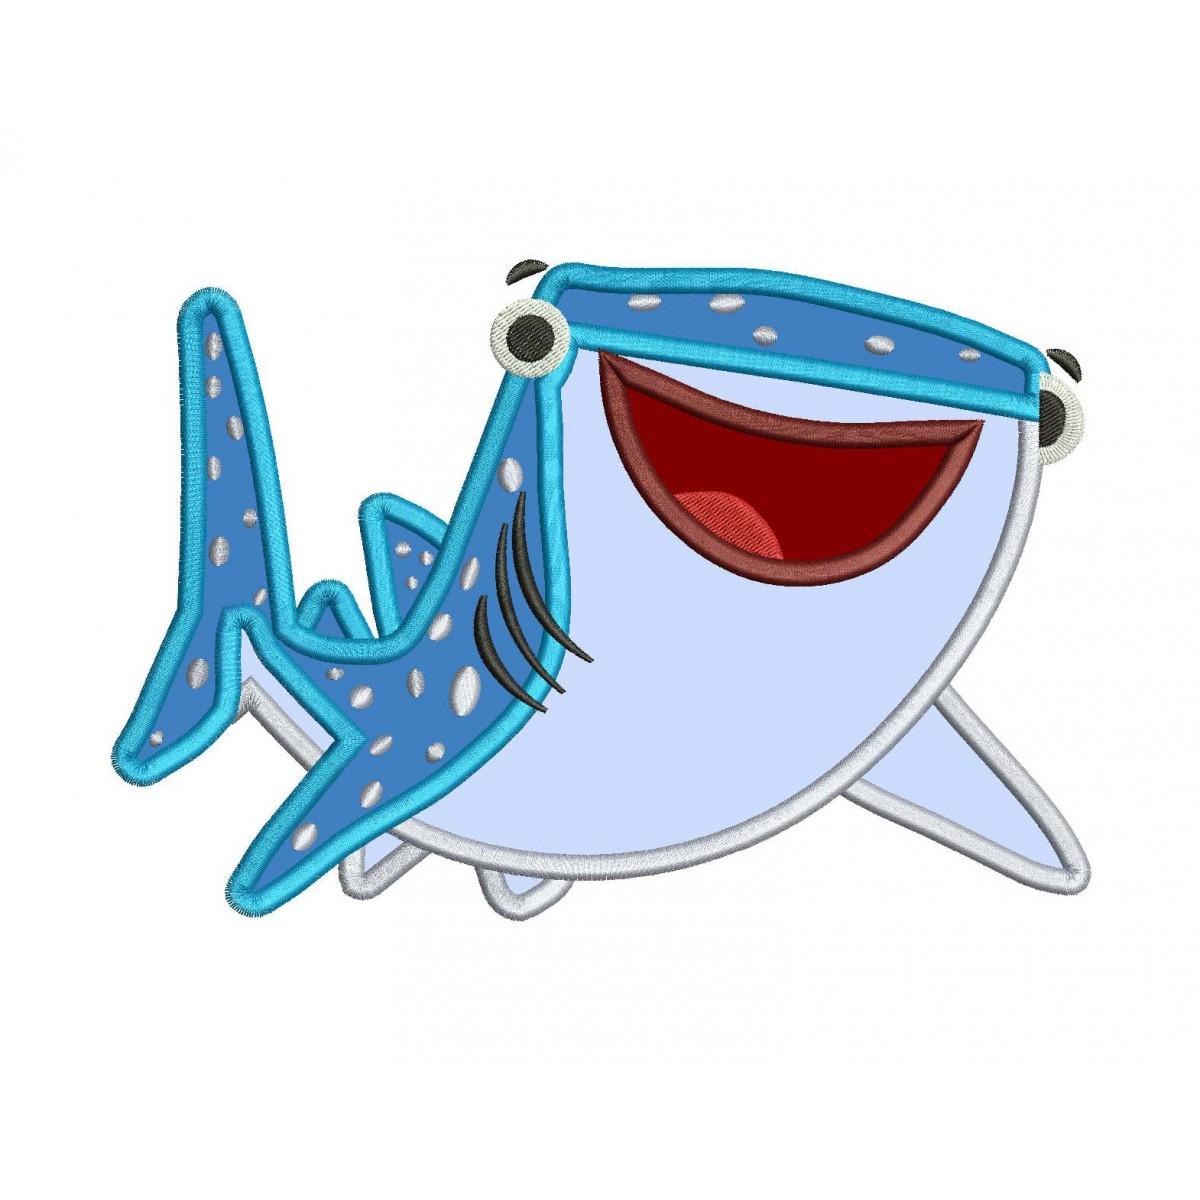 2d313aebb0b Destiny shark finding dory embroidery applique design jpg 1200x1200 Whale  shark finding dory